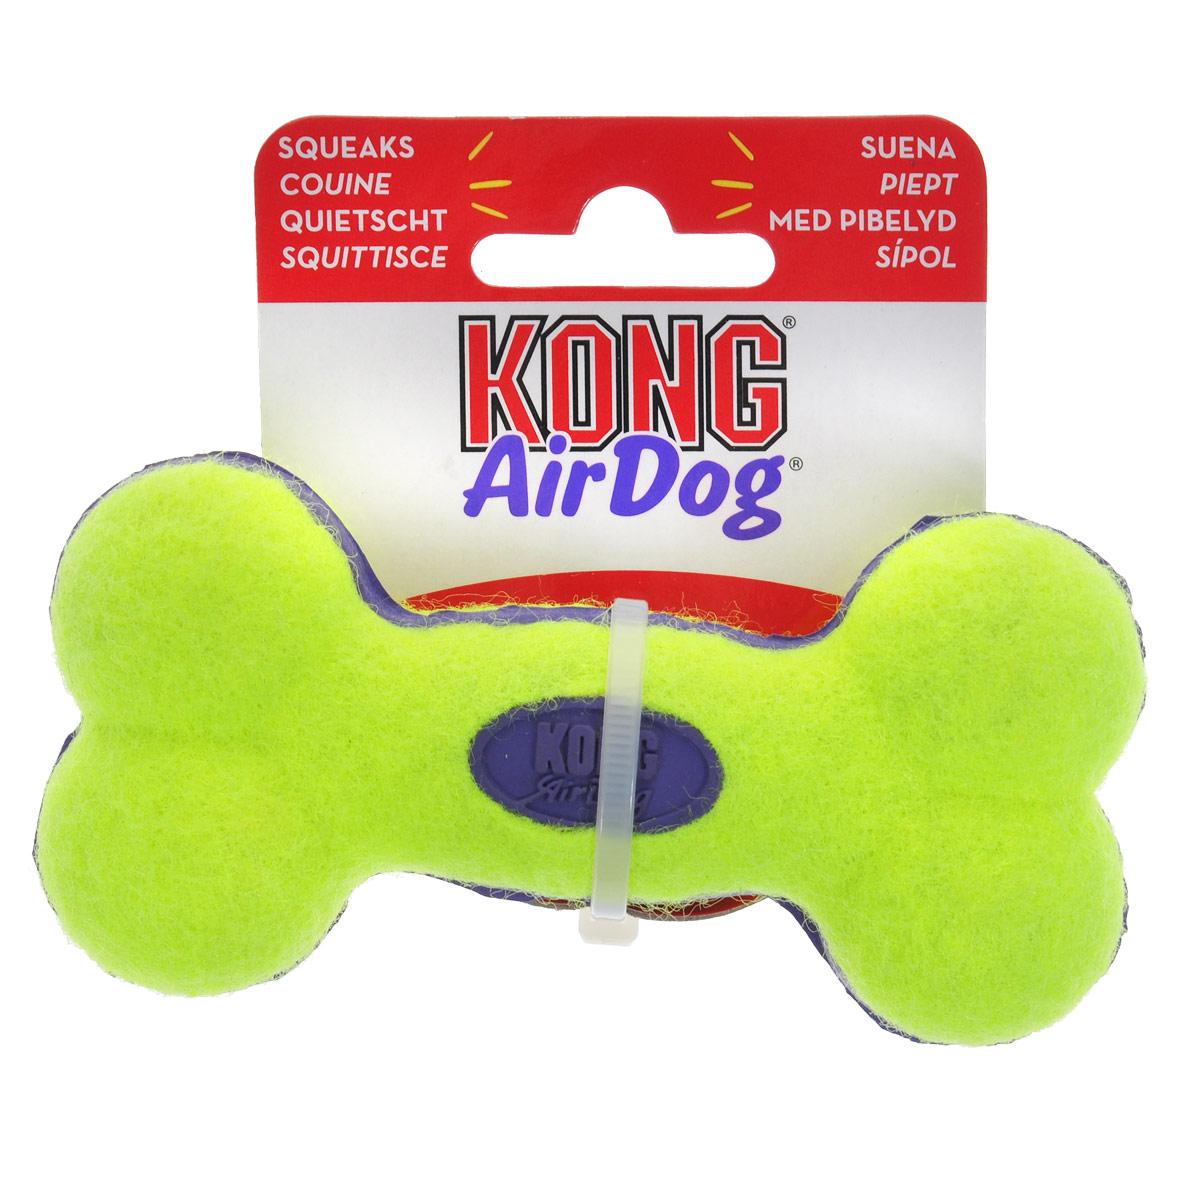 Игрушка для собак Kong Air Косточка. ASB3 игрушка для собак kong косточка средняя с пищалкой цвет фиолетовый 15 5 х 6 5 х 3 5 см